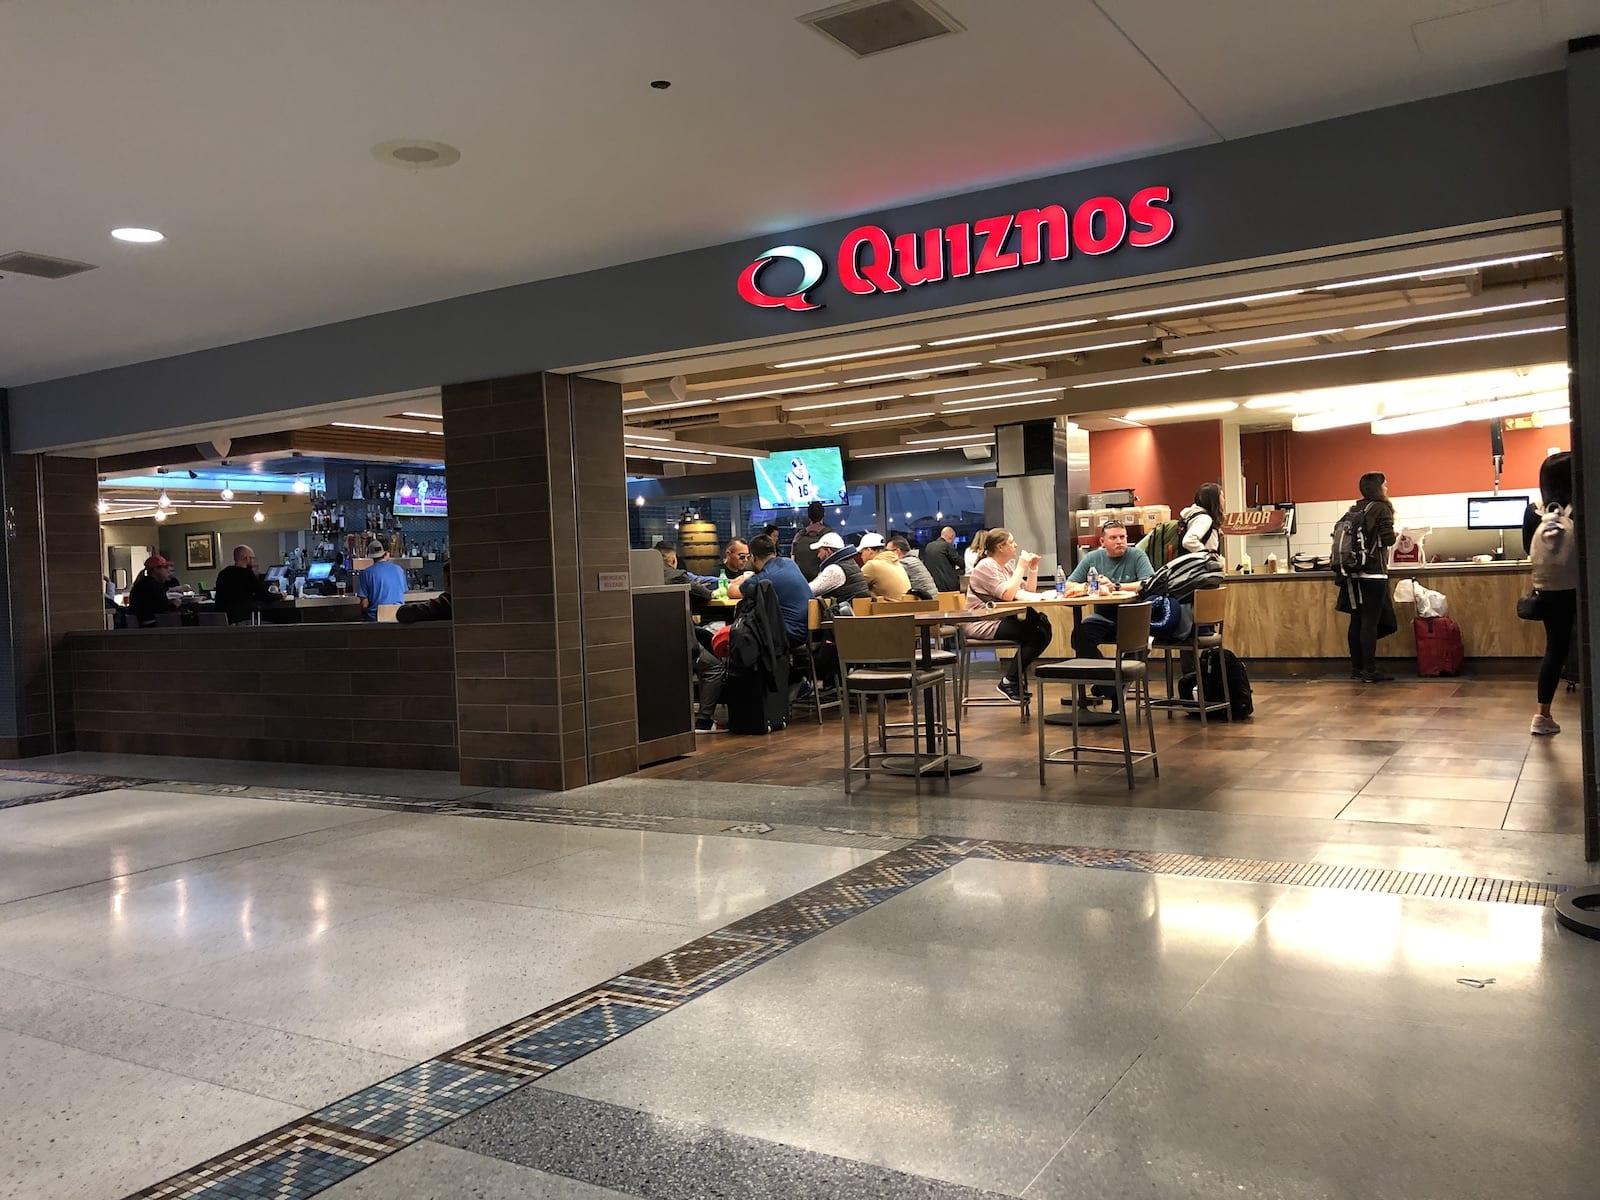 Denver Airport Quiznos Restaurant Concourse B